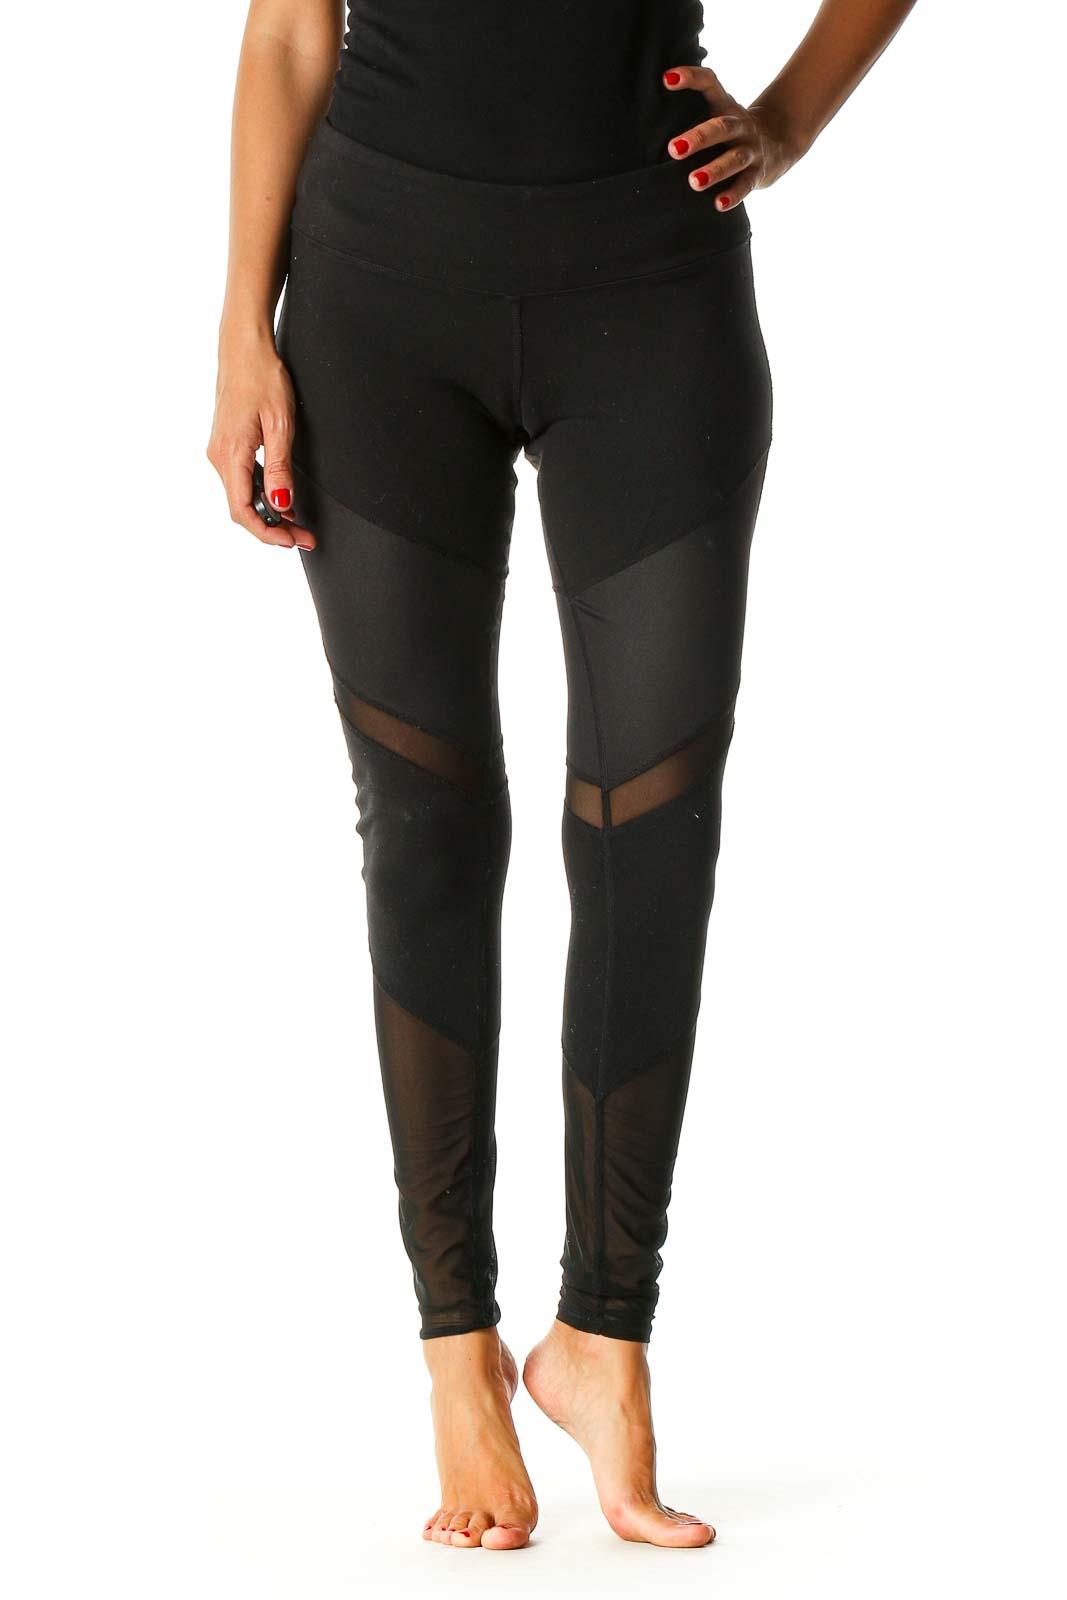 Black Textured Activewear Leggings Front